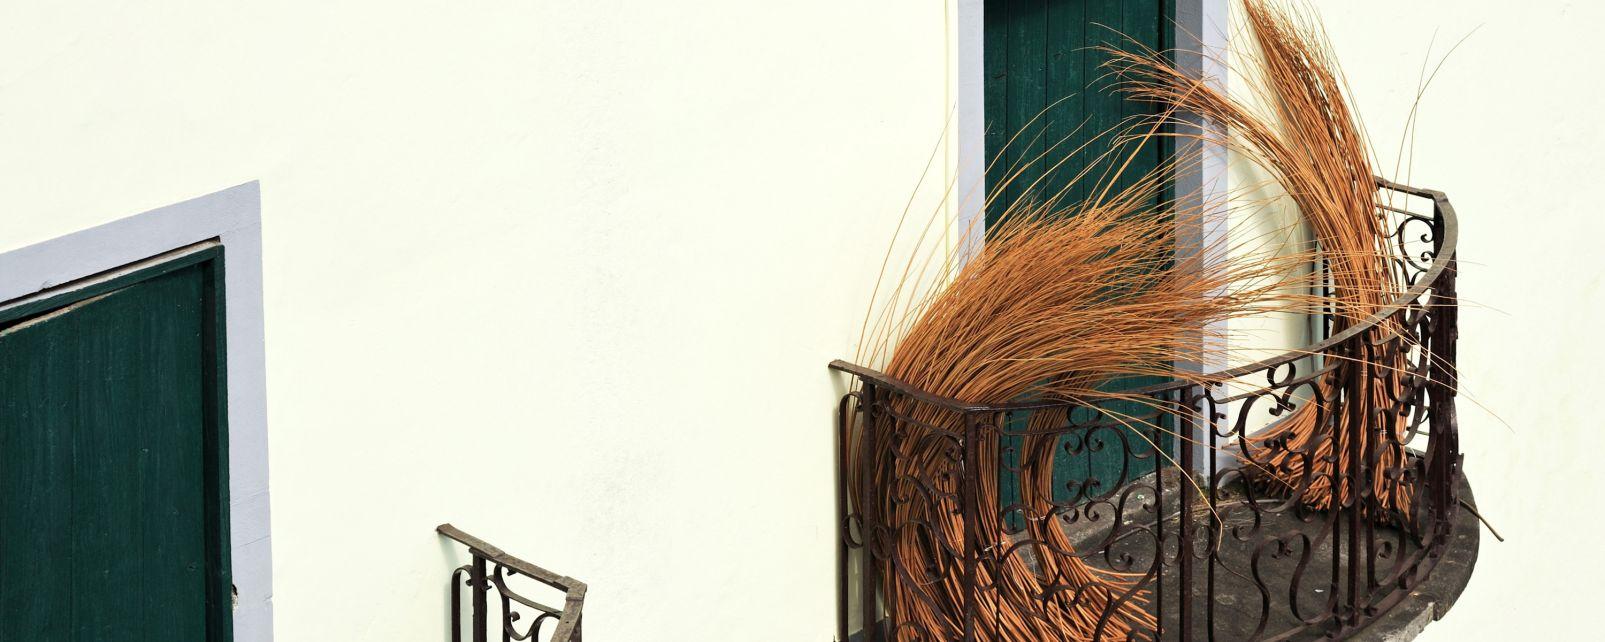 Handiwork, Basketworks, Arts and culture, Madeira